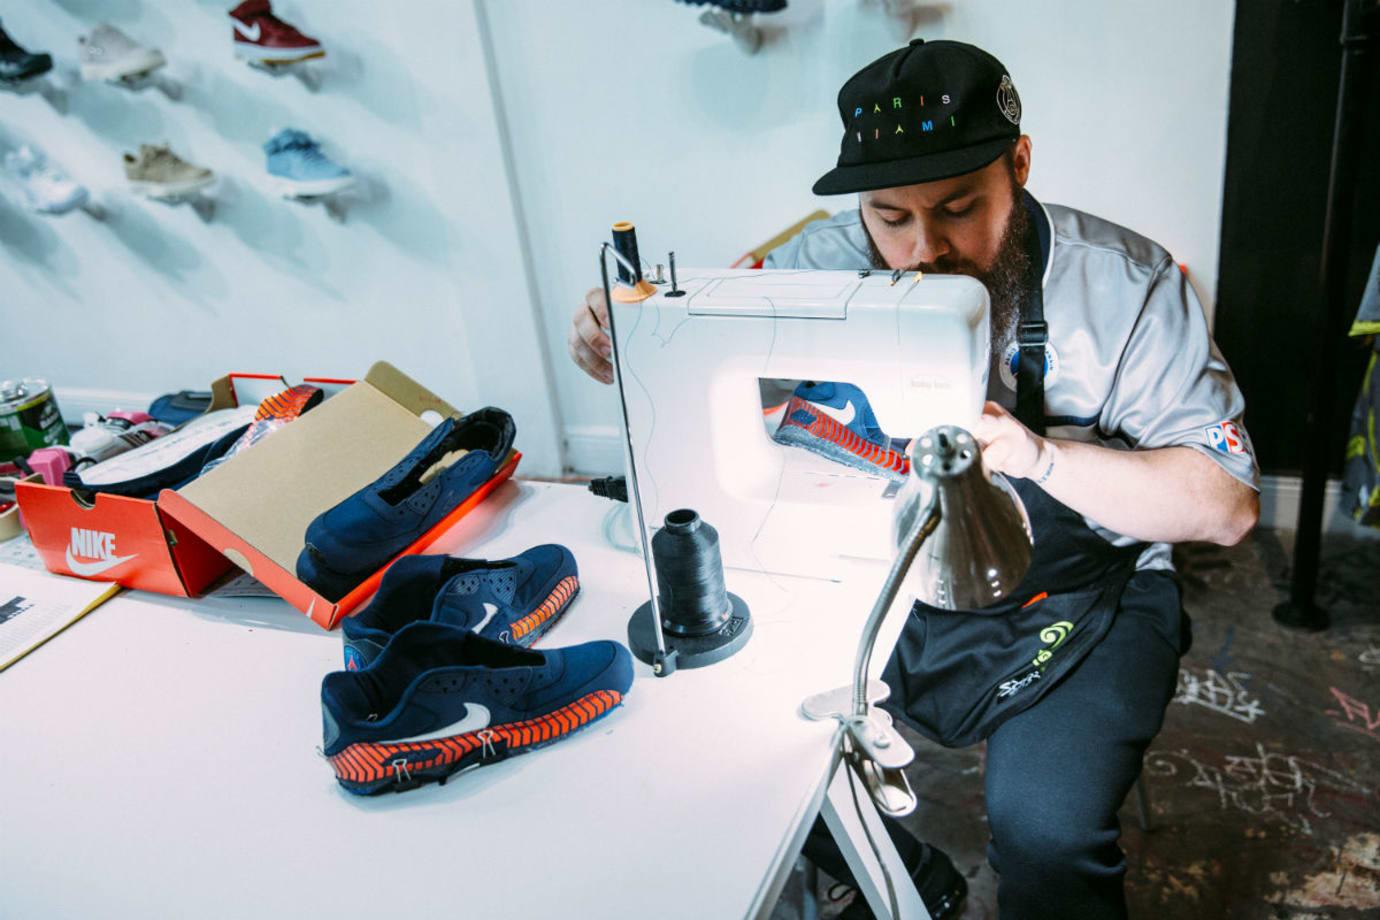 PSG x Nike Air Max 90 (4)